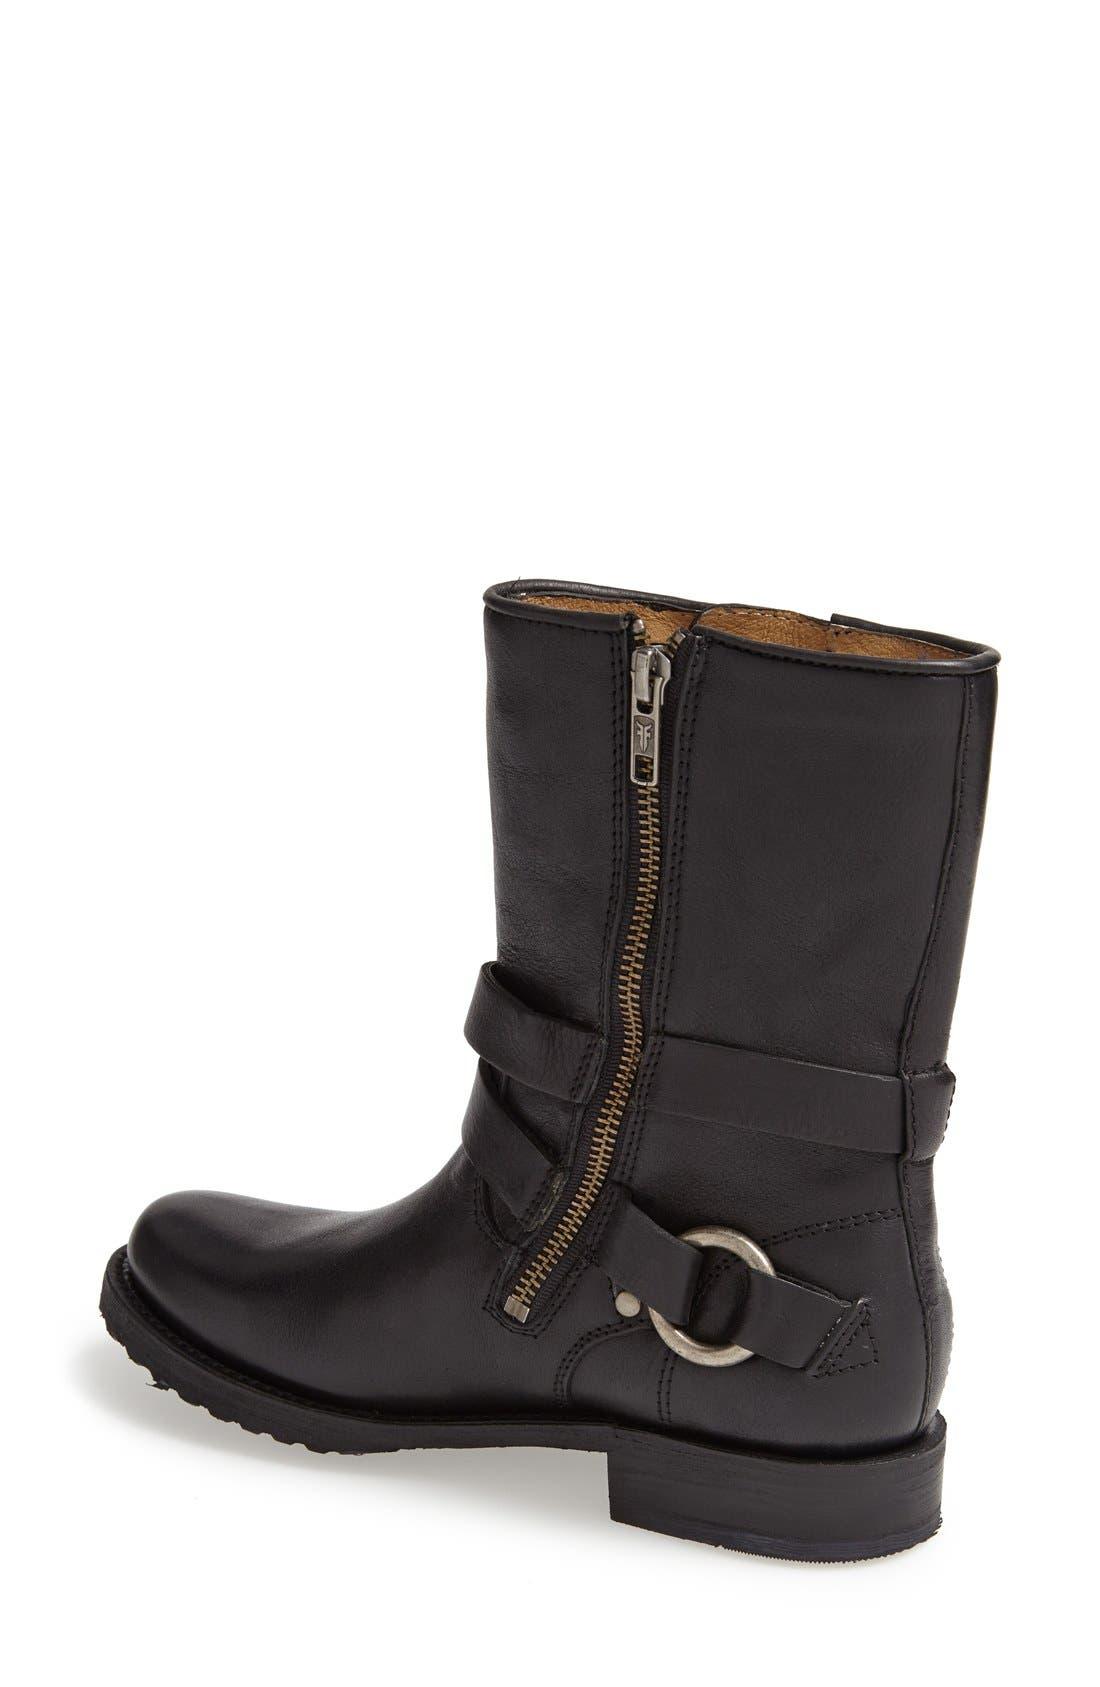 Alternate Image 2  - Frye 'Veronica' Crisscross Strap Short Leather Boot (Women)